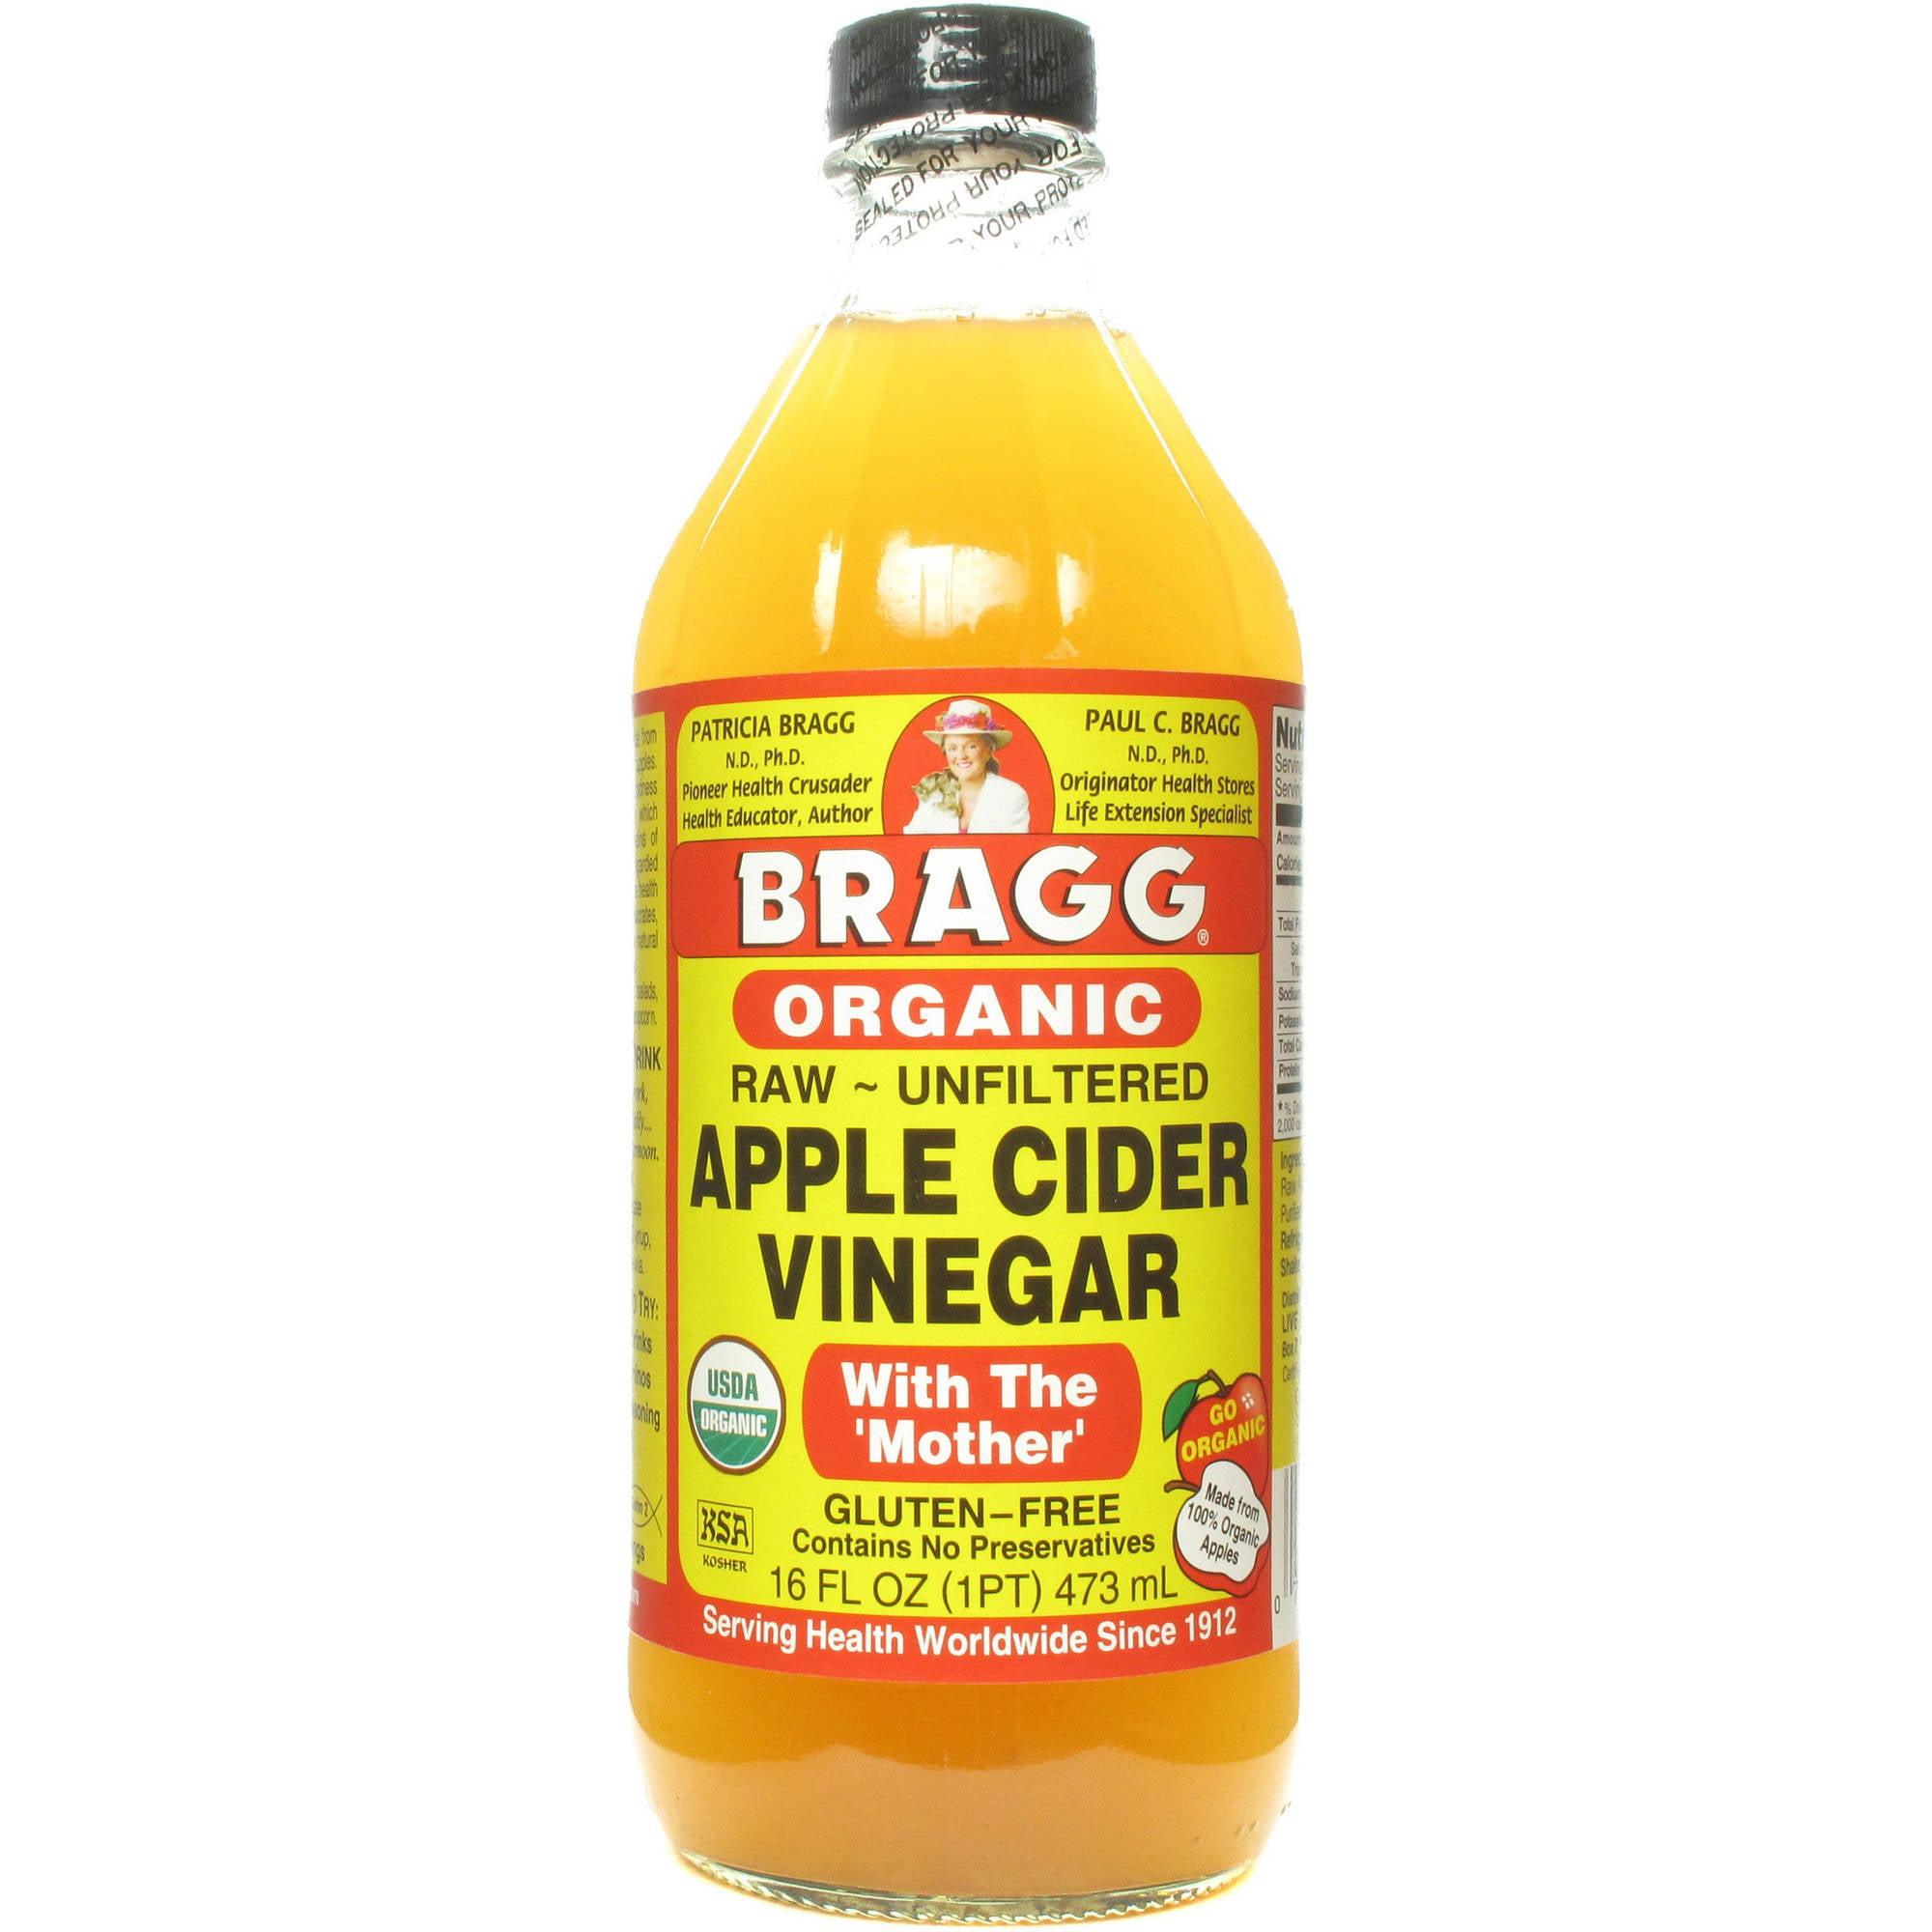 Bragg Apple Cider Vinegar, 16 FL OZ (Pack of 12) by